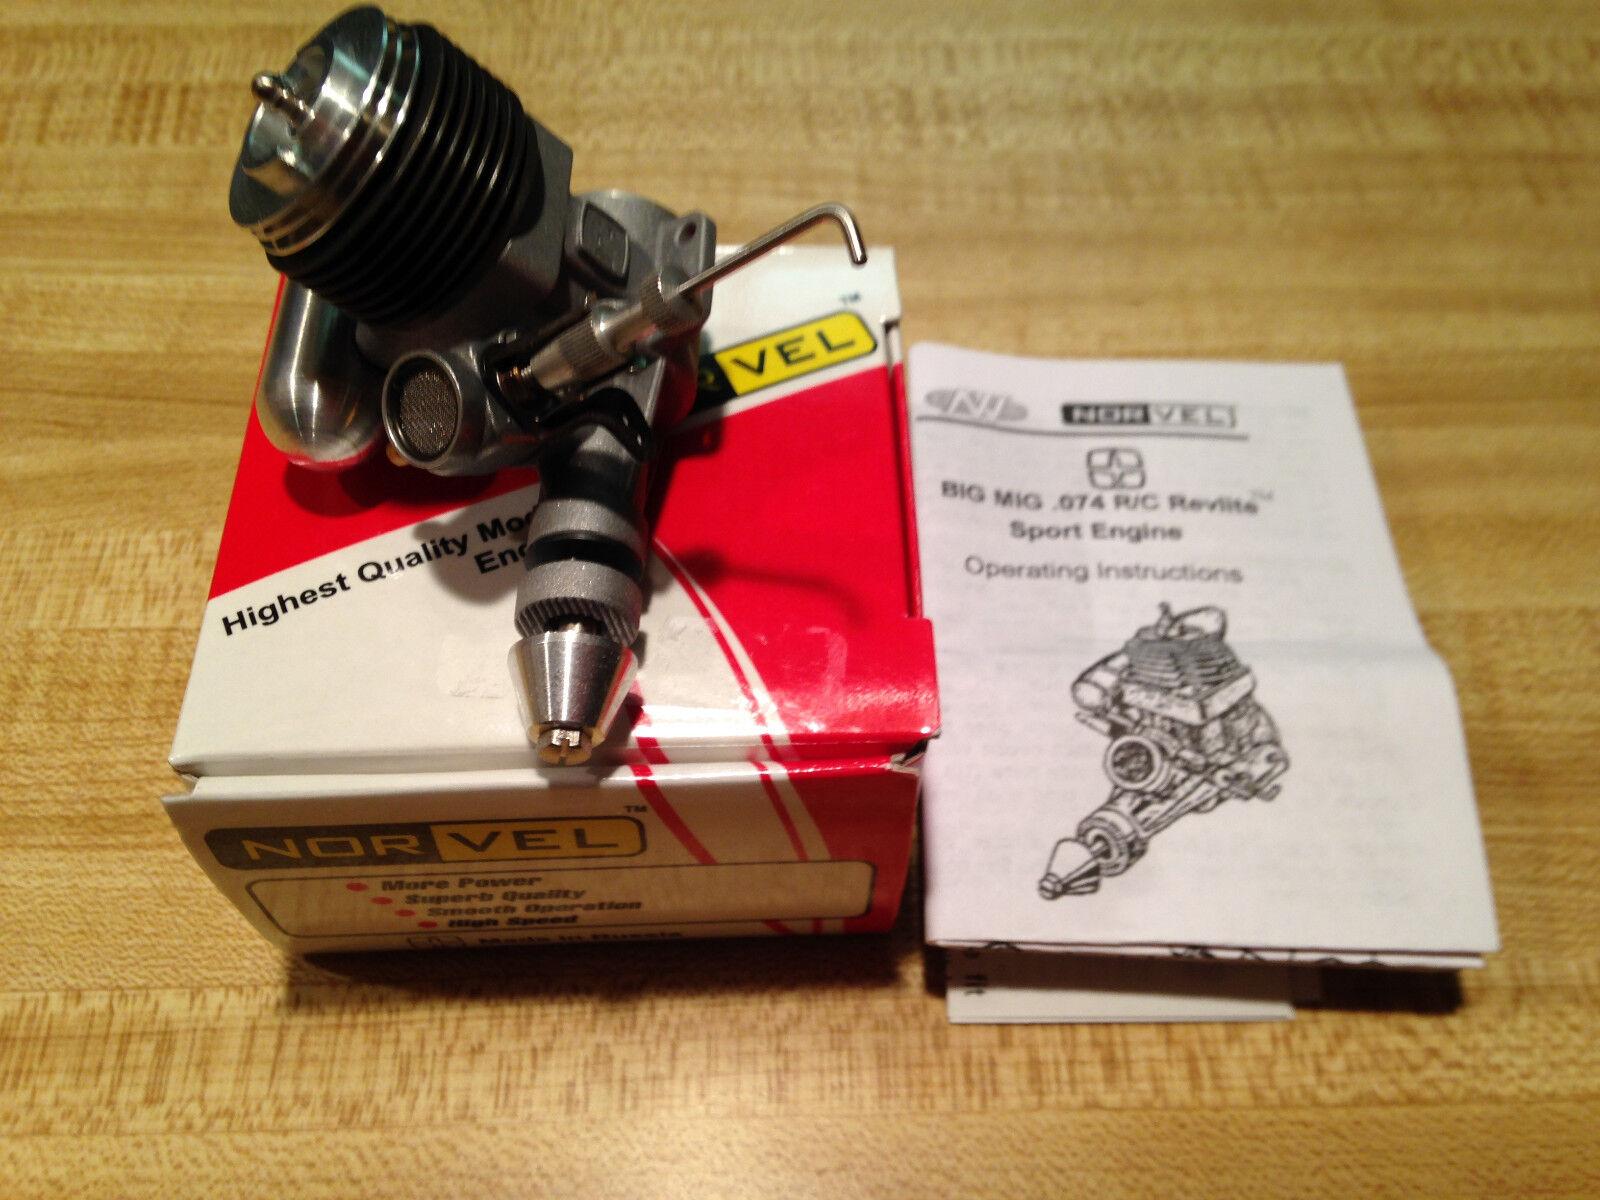 New R C Norvel Big Mig .074 Revlite Sport Engine - B7R WithThrossotle